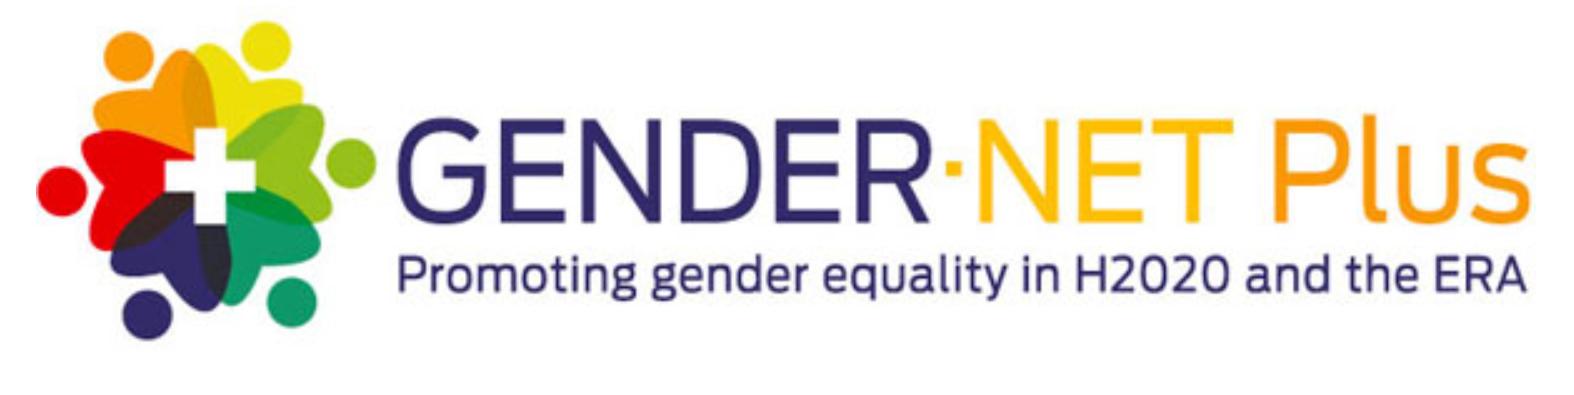 GENDER-NET logo printscreen